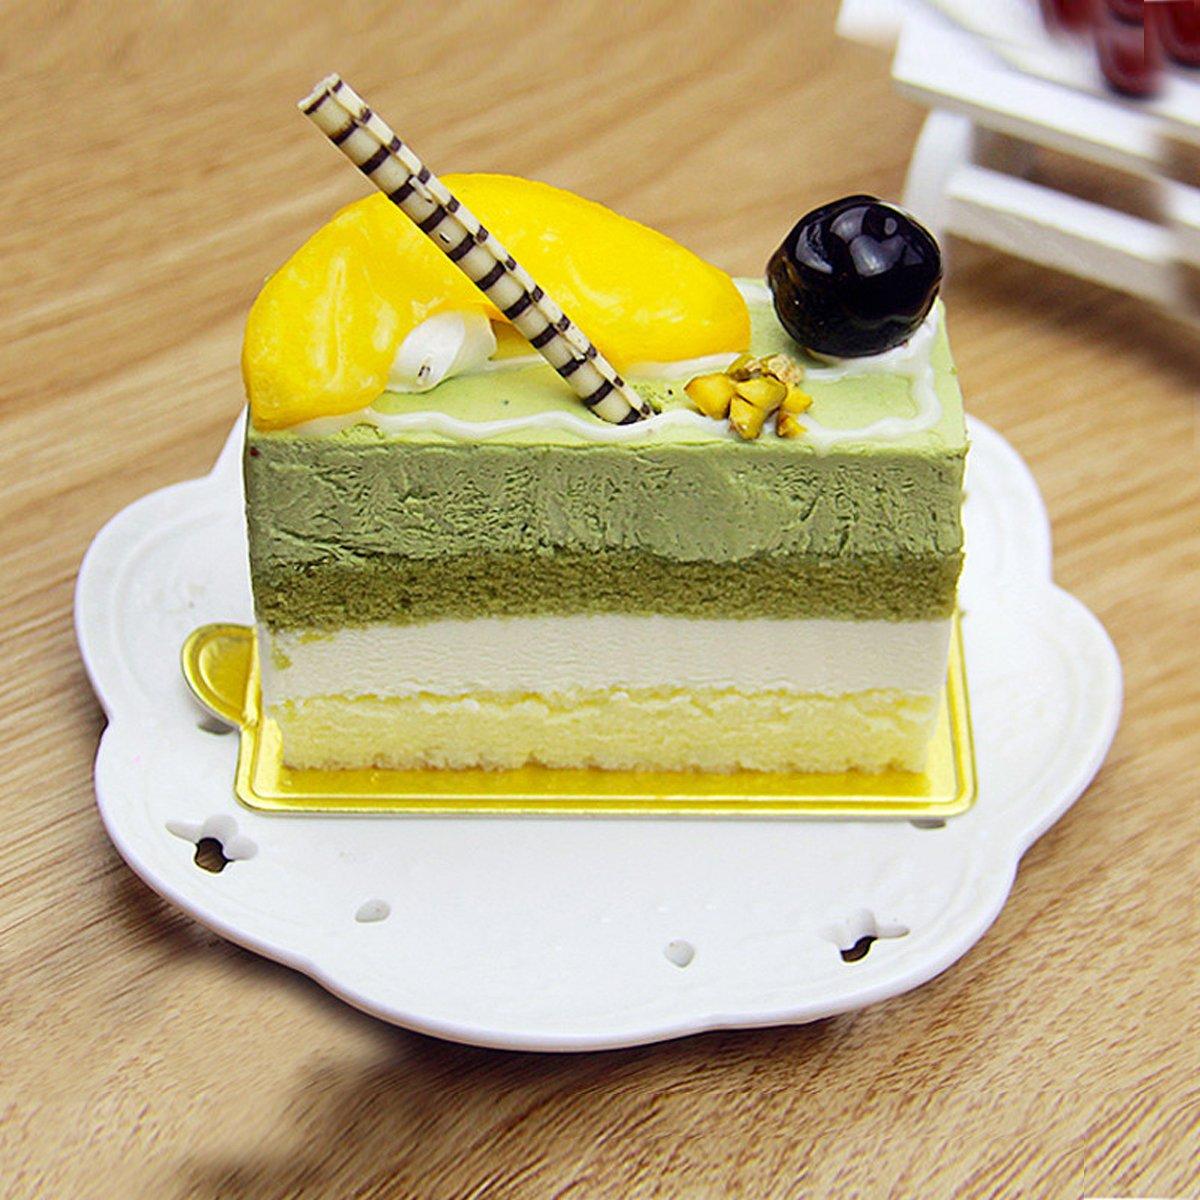 Amazon.com Sealike Golden Cake Parper Base Cake Paper Plates Dessert Paper Base Set of 100 with Stylus Industrial u0026 Scientific & Amazon.com: Sealike Golden Cake Parper Base Cake Paper Plates ...